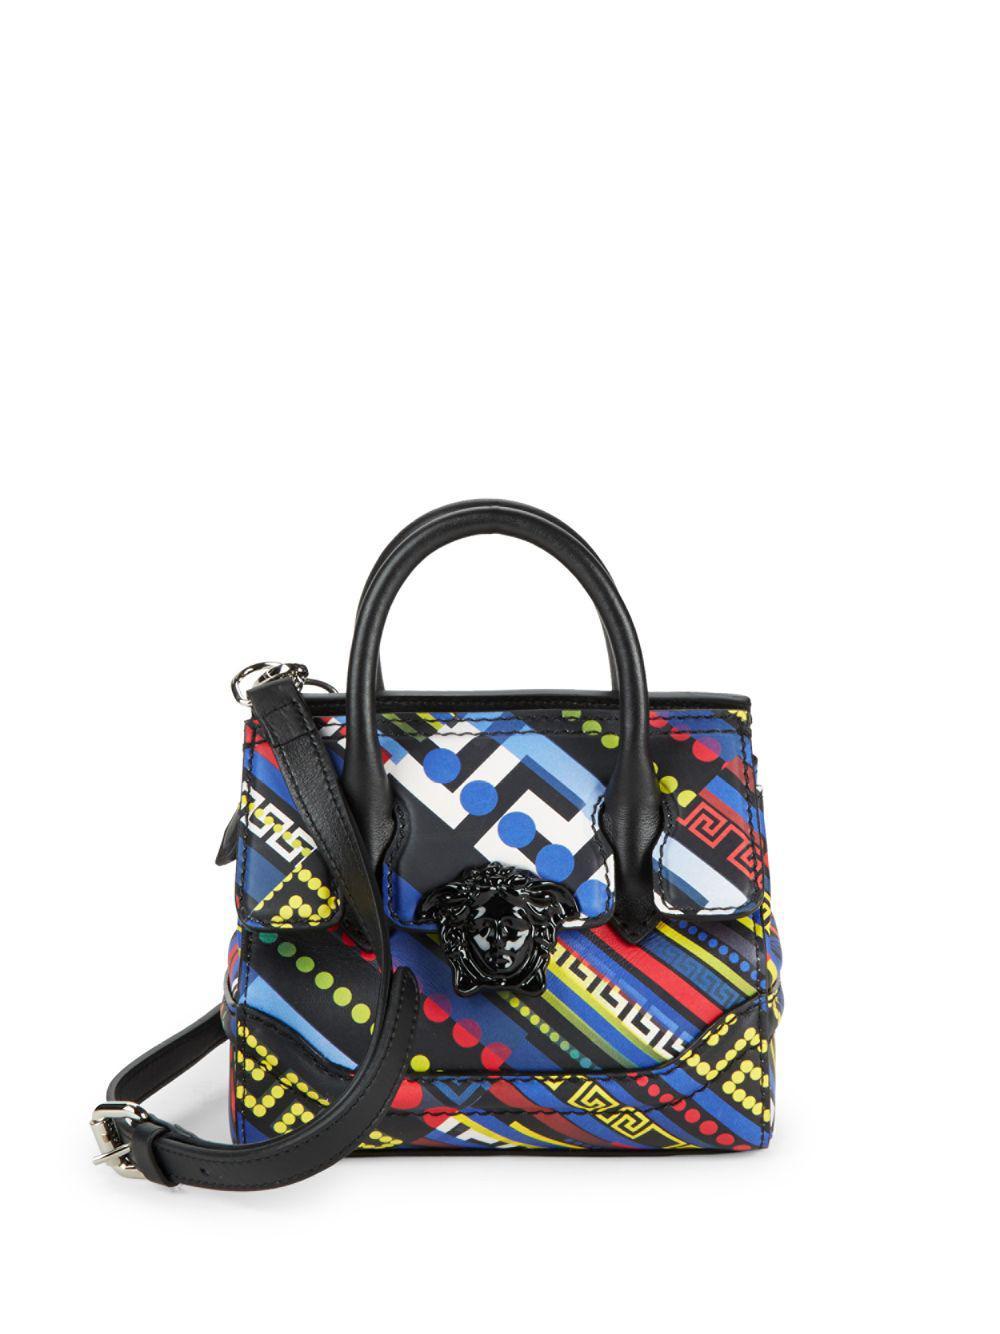 54ef200032ed Lyst - Versace Geometric-print Leather Crossbody Bag in Blue